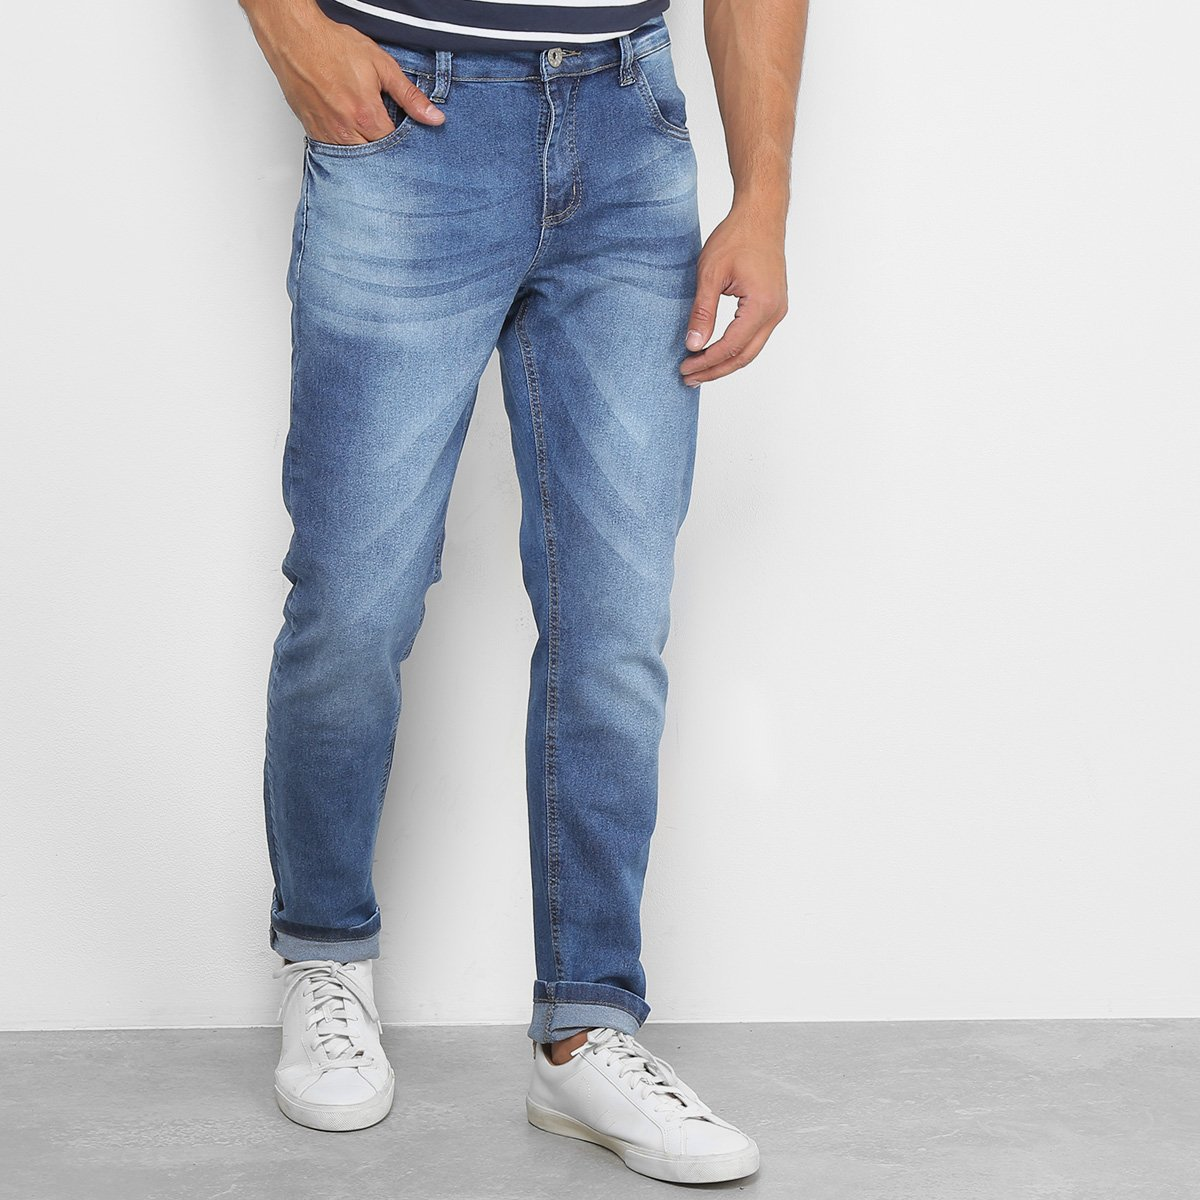 e7452f1ee Calça Jeans Slim RockBlue Estonada Masculina